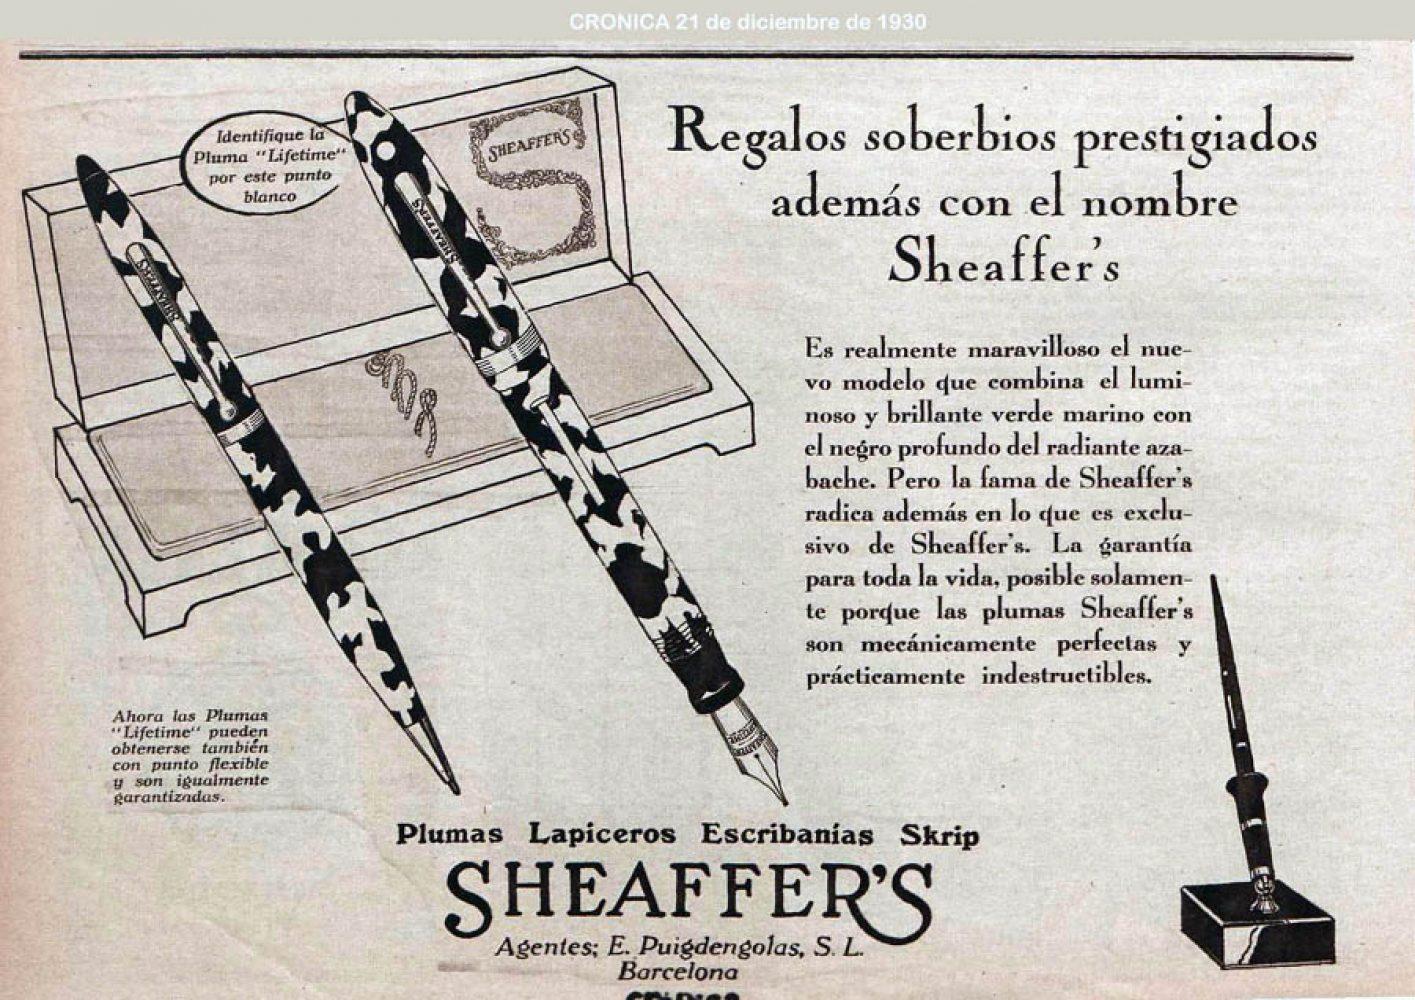 1930 12 21 Ad in Spanish Cronica